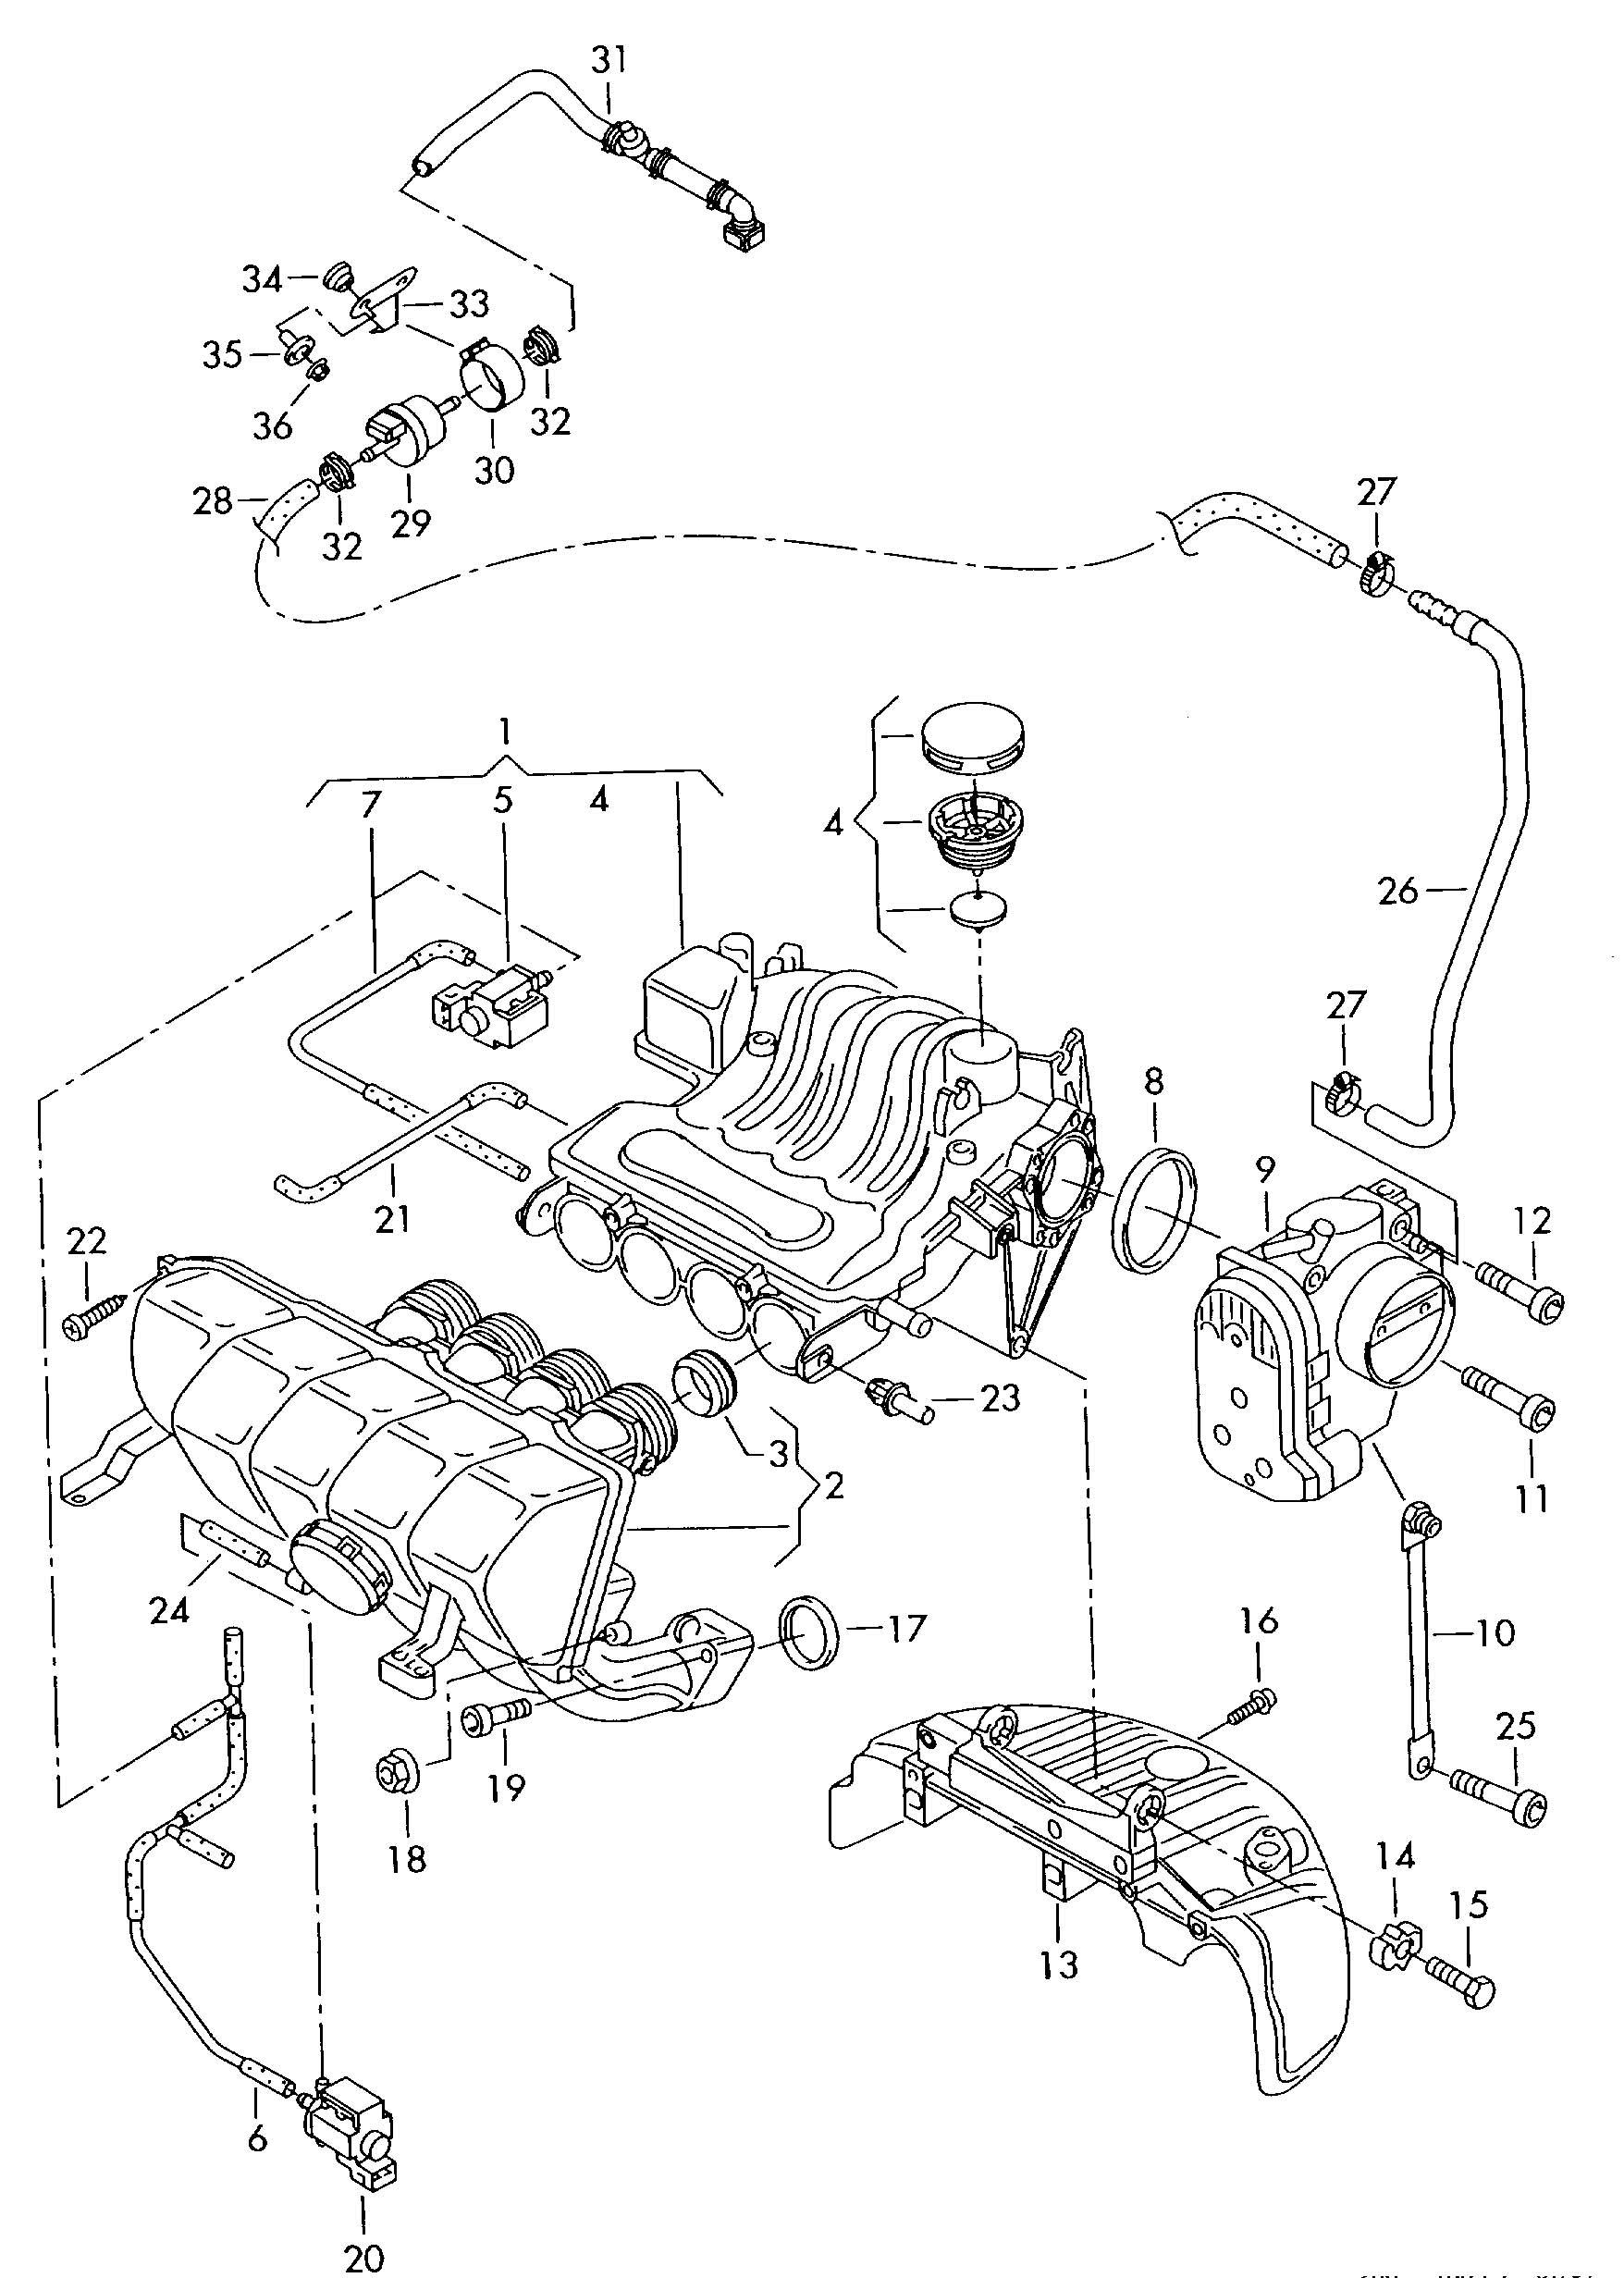 06A198205A - Volkswagen Repair kit for valve unit | Jim ...